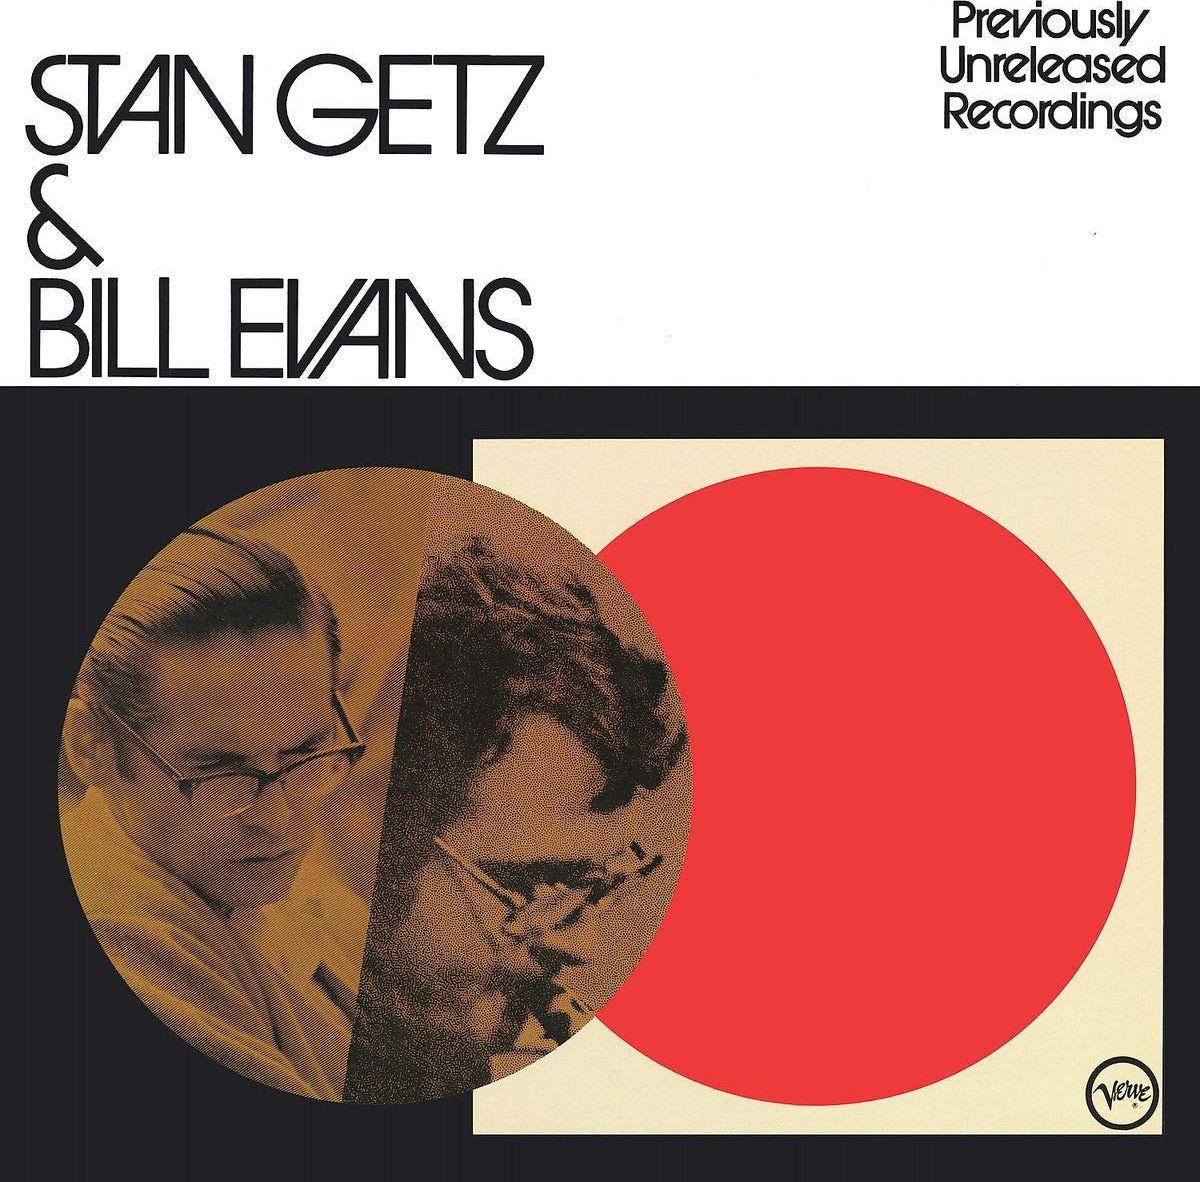 Стэн Гетц,Билл Эванс Stan Getz, Bill Evans. Stan Getz & Bill Evans (LP) стэн гетц stan getz big band bossa nova lp